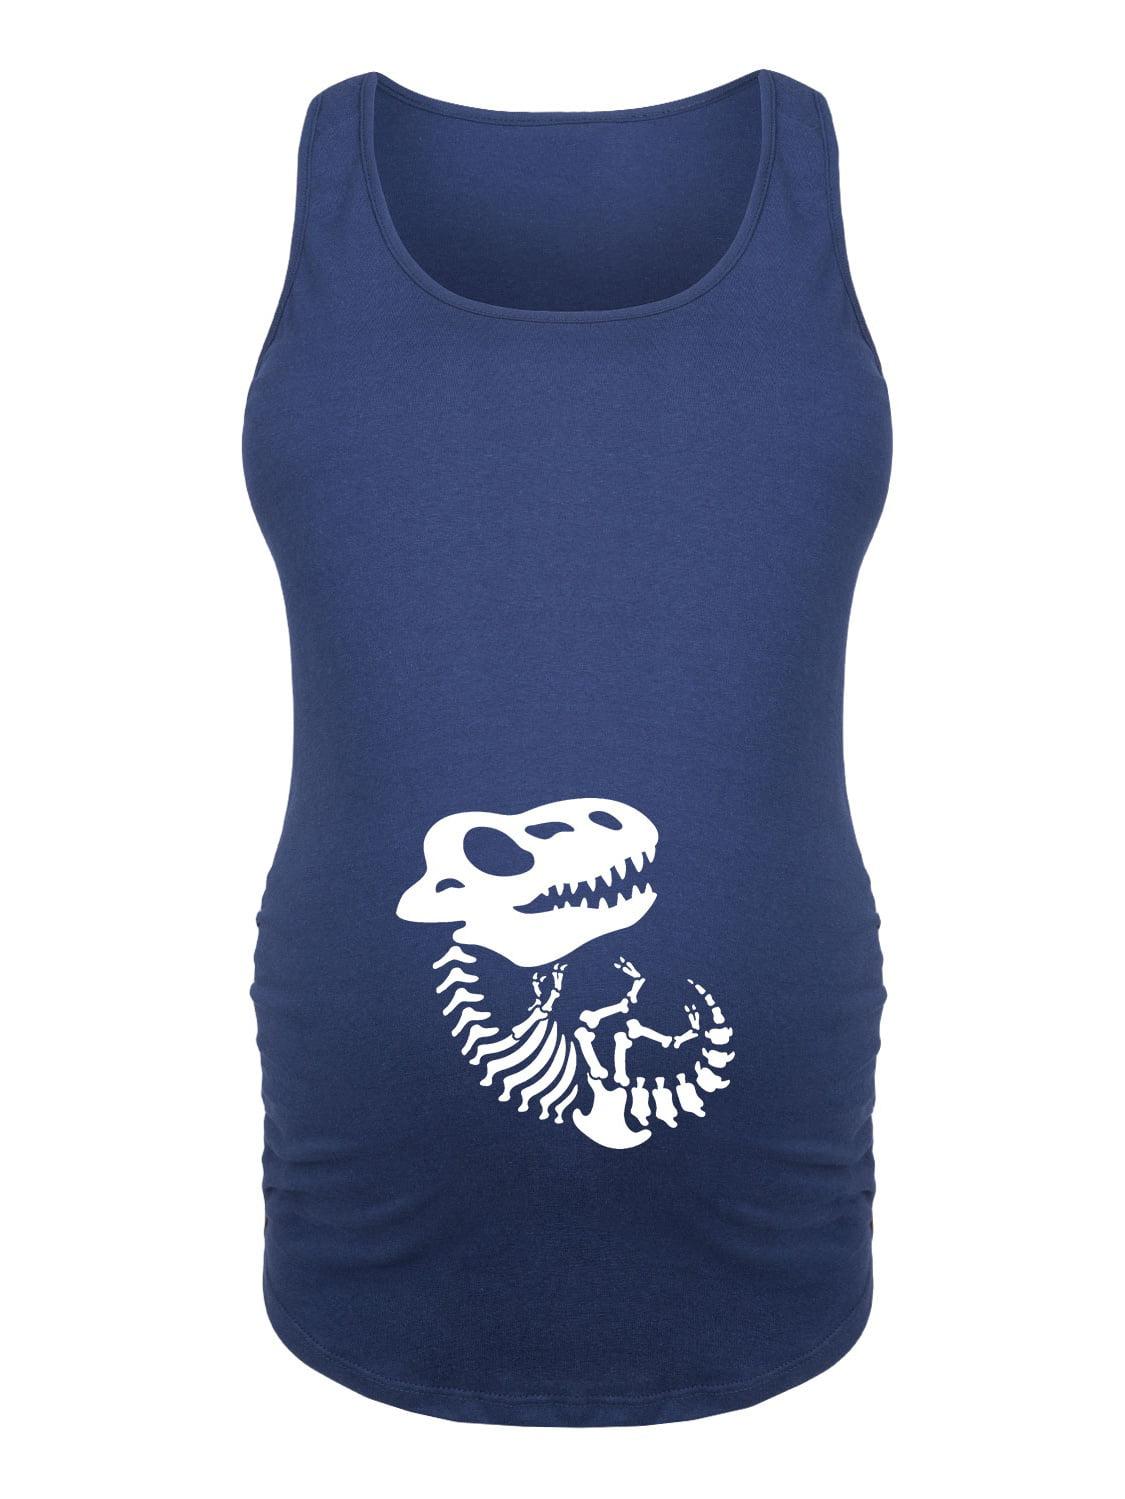 Skeleton Dinosaur Belly - Ladies Maternity Tank